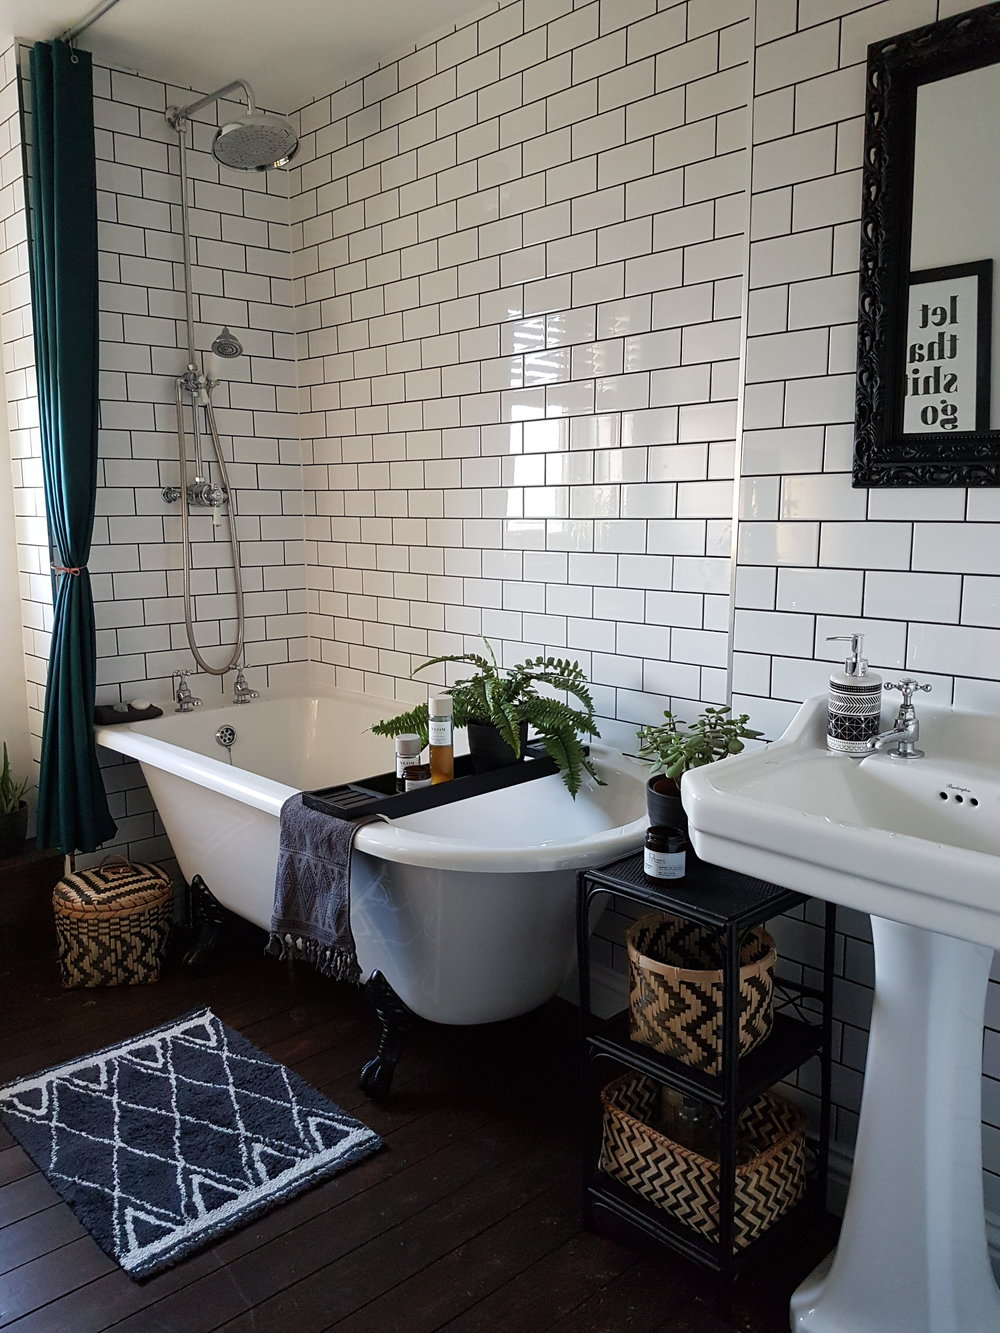 subway tiled bathroom, new york subway tiles,